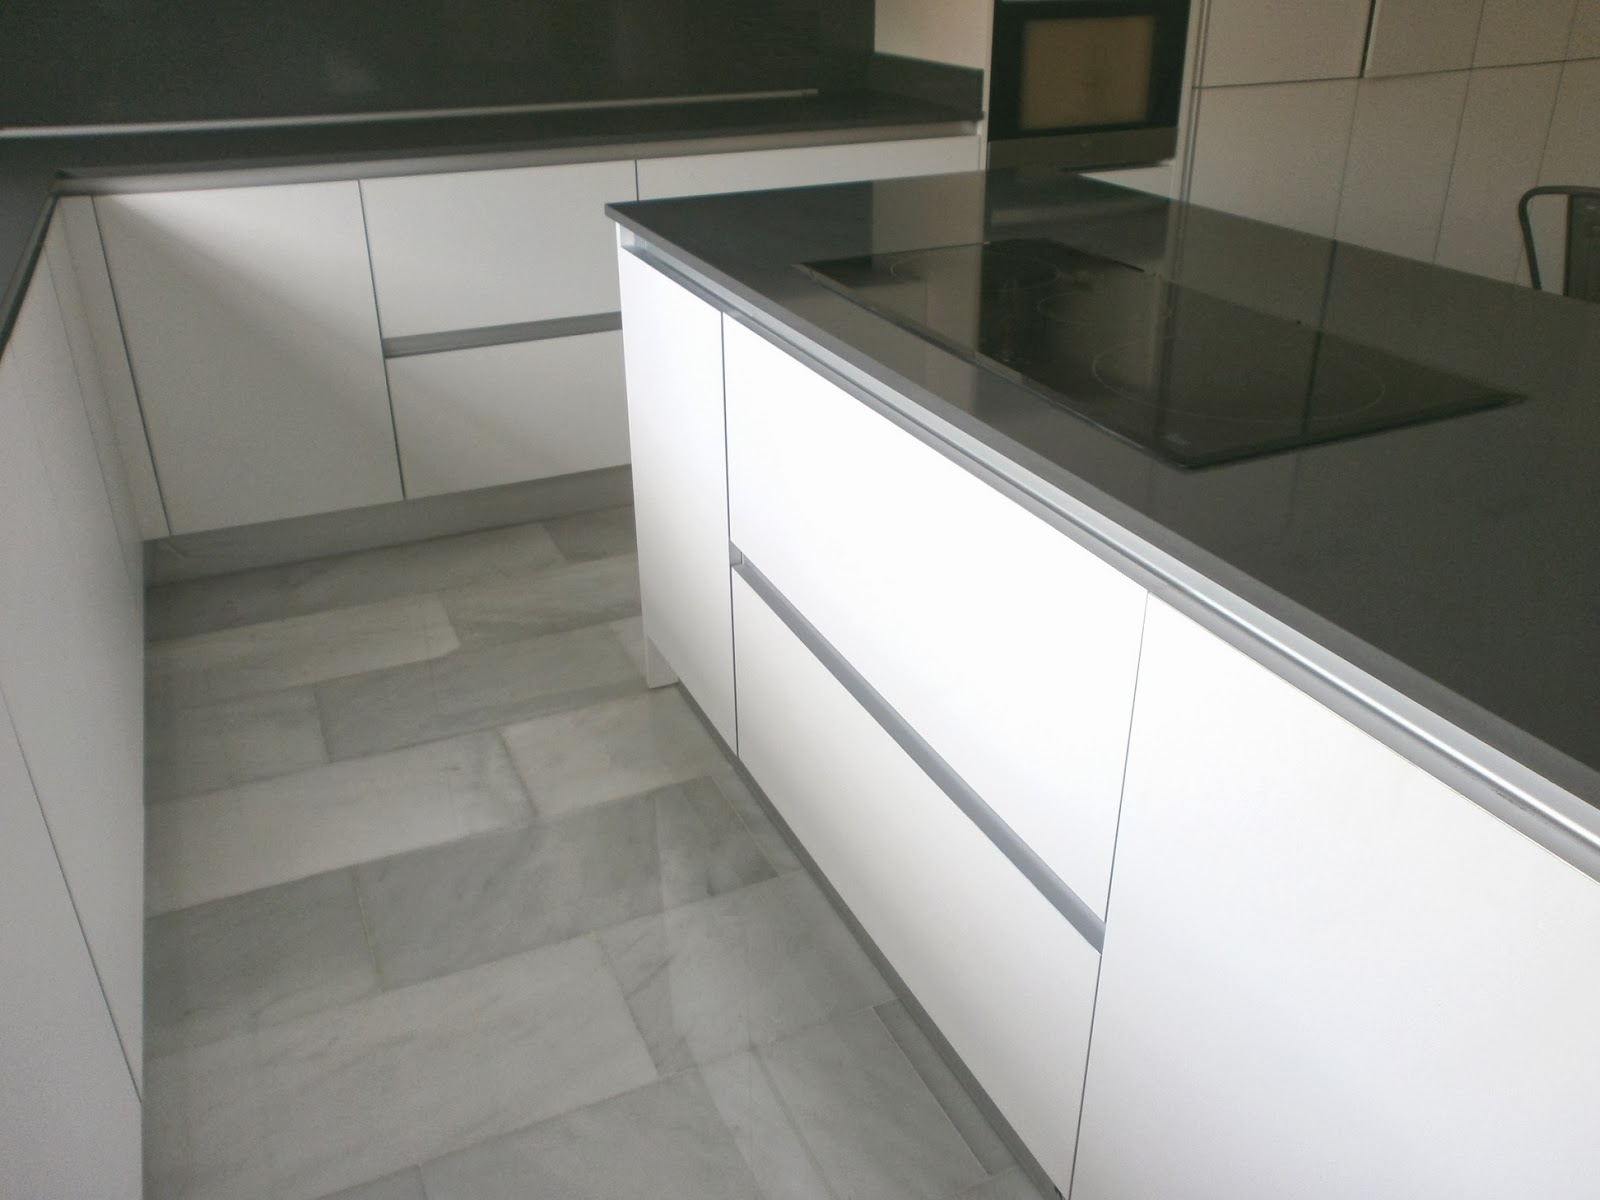 Encantadora cocina blanca independiente con isla y office - Tiradores cocina modernos ...